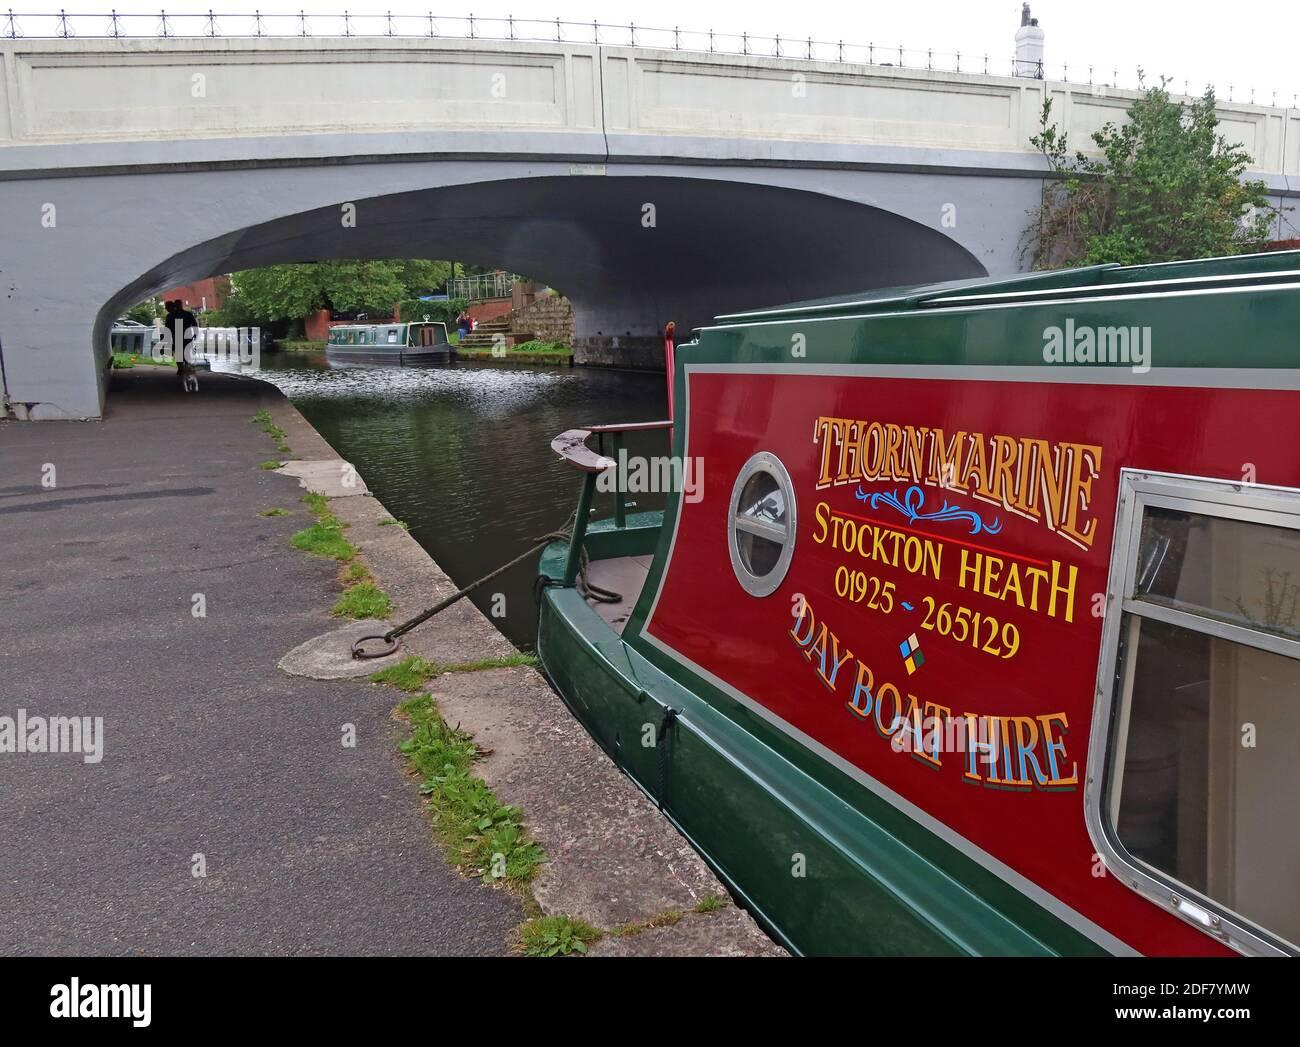 Dieses Stockfoto: Thorn Marine Dayboat Verleih, Stockton Heath, 01925-265129, Day Boat Hire, Warrington, Cheshire, England, Großbritannien, WA4 6LE, Bridgewater Canal - 2DF7YM